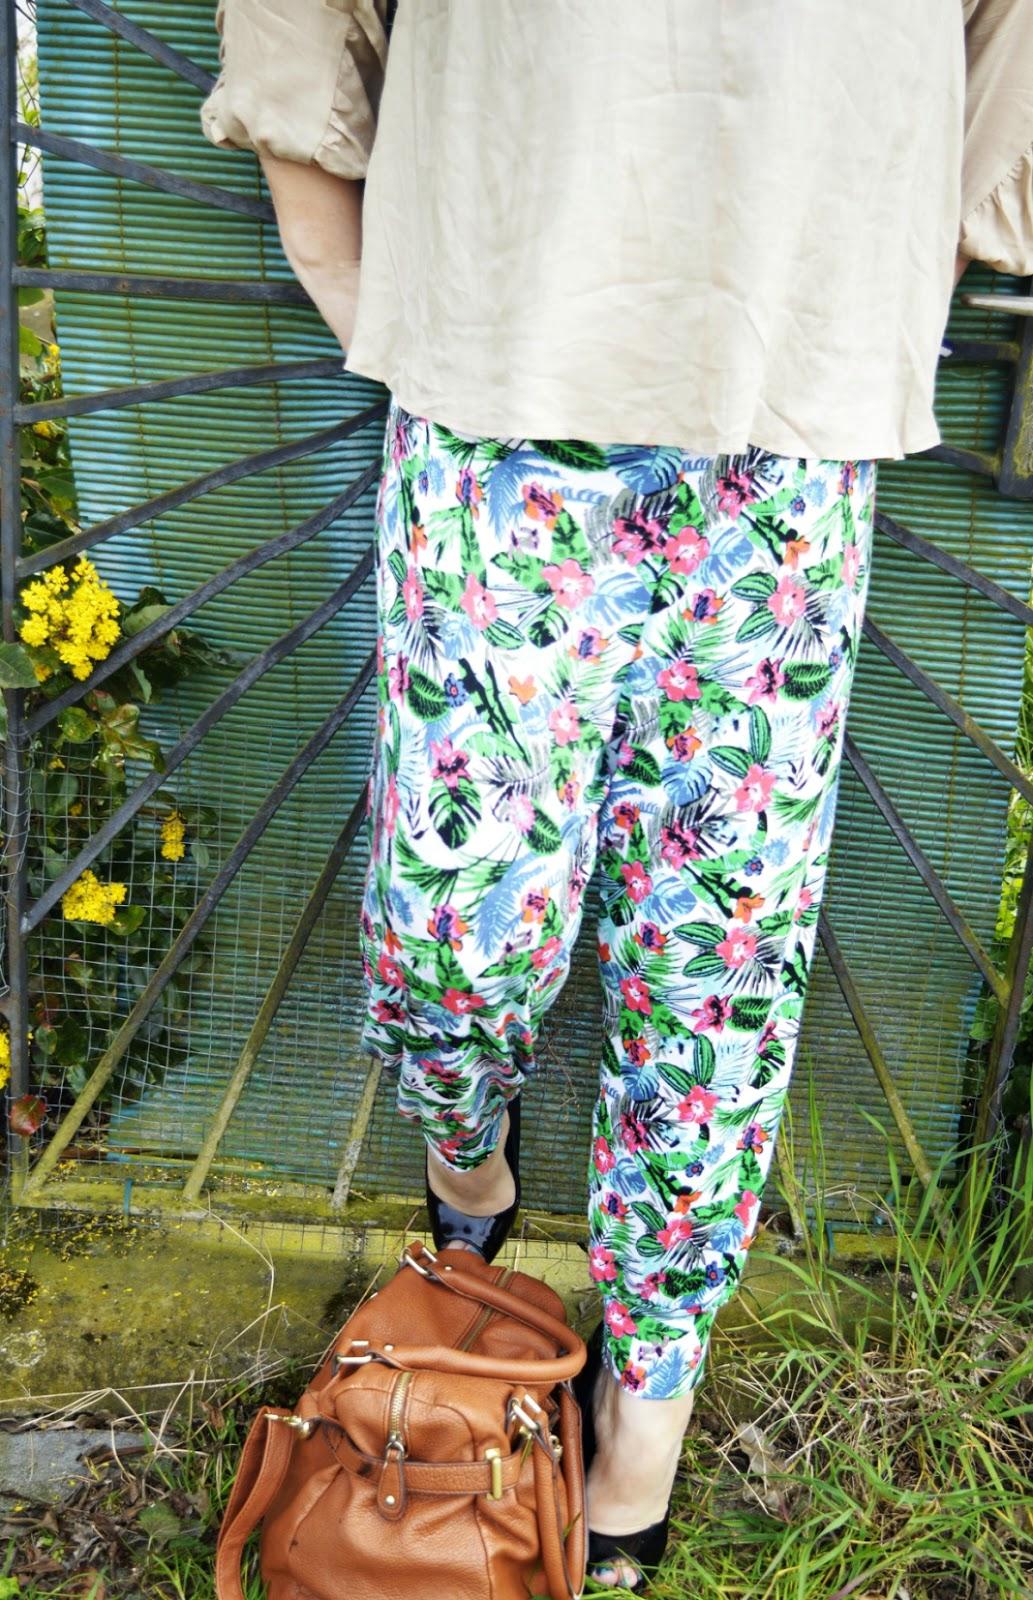 Outfit Post Harem pants & blouse Outfit Photo Details